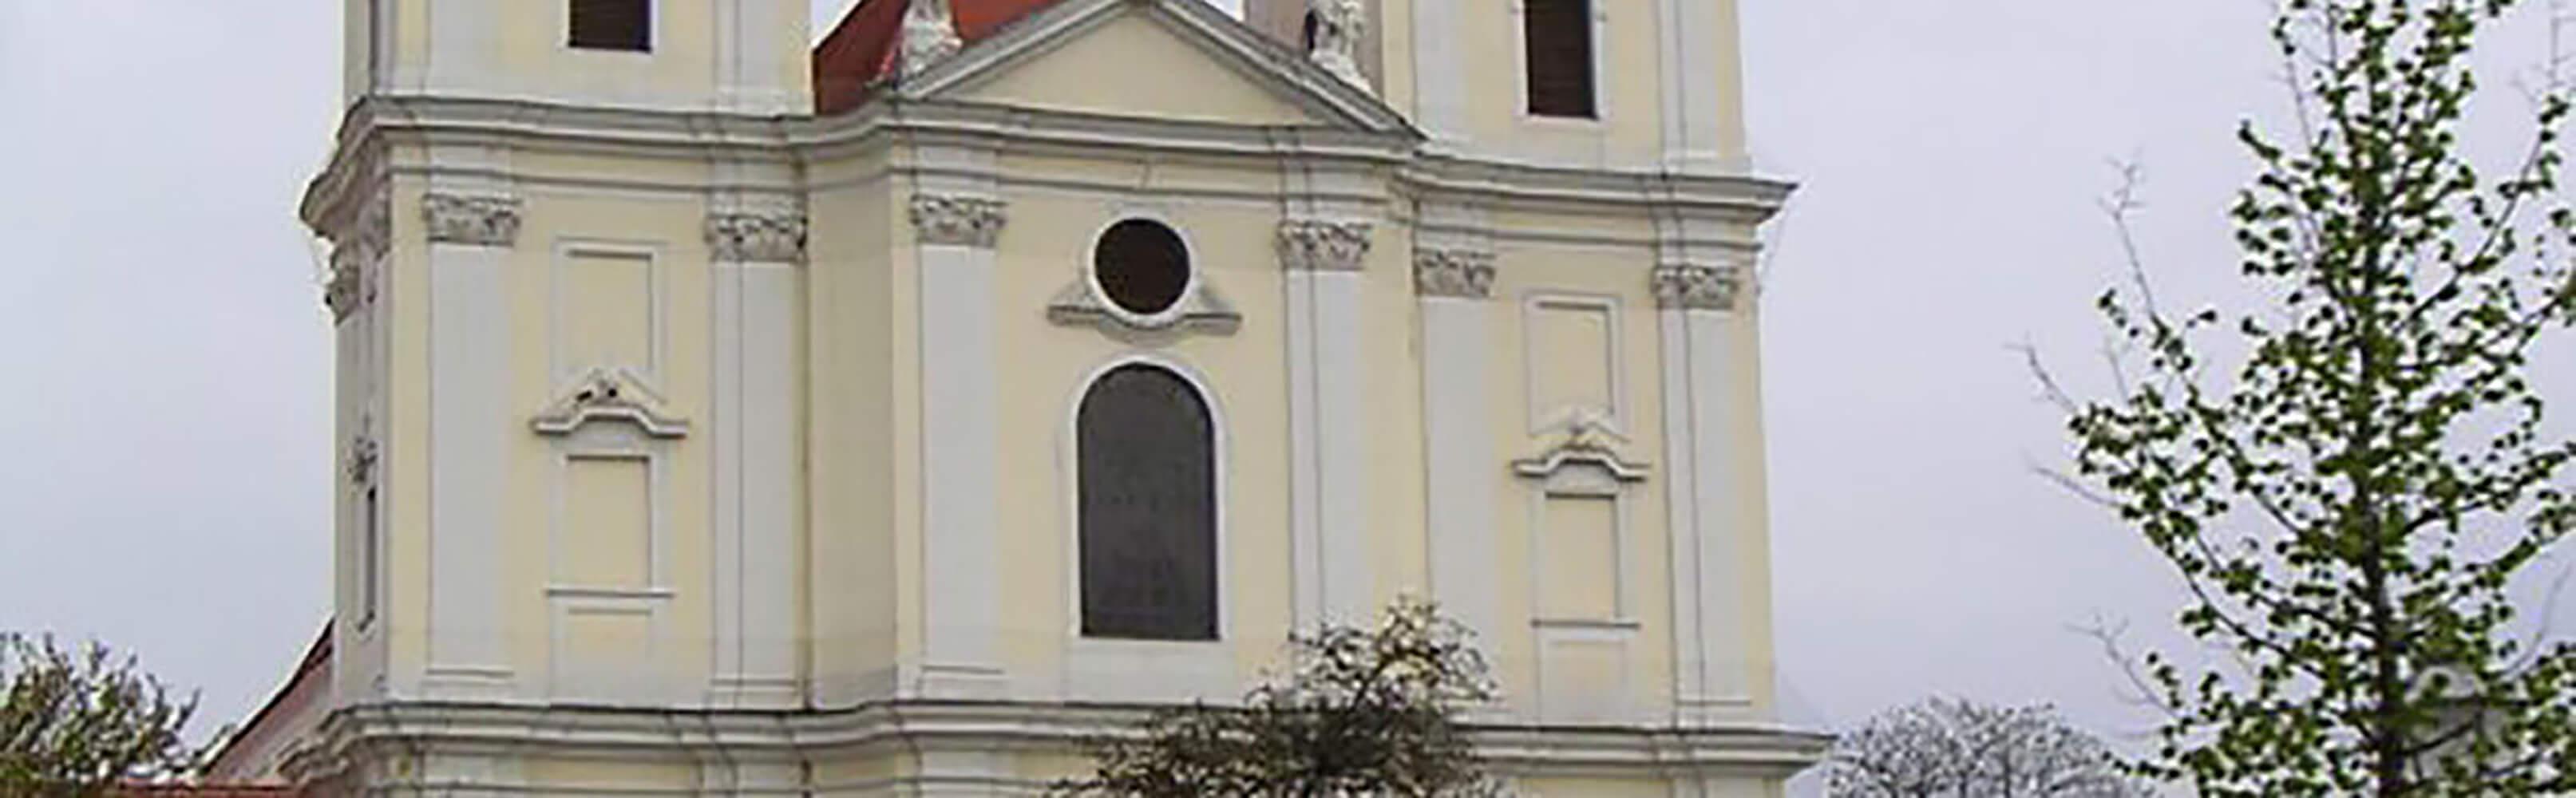 Basilika Mariä Geburt